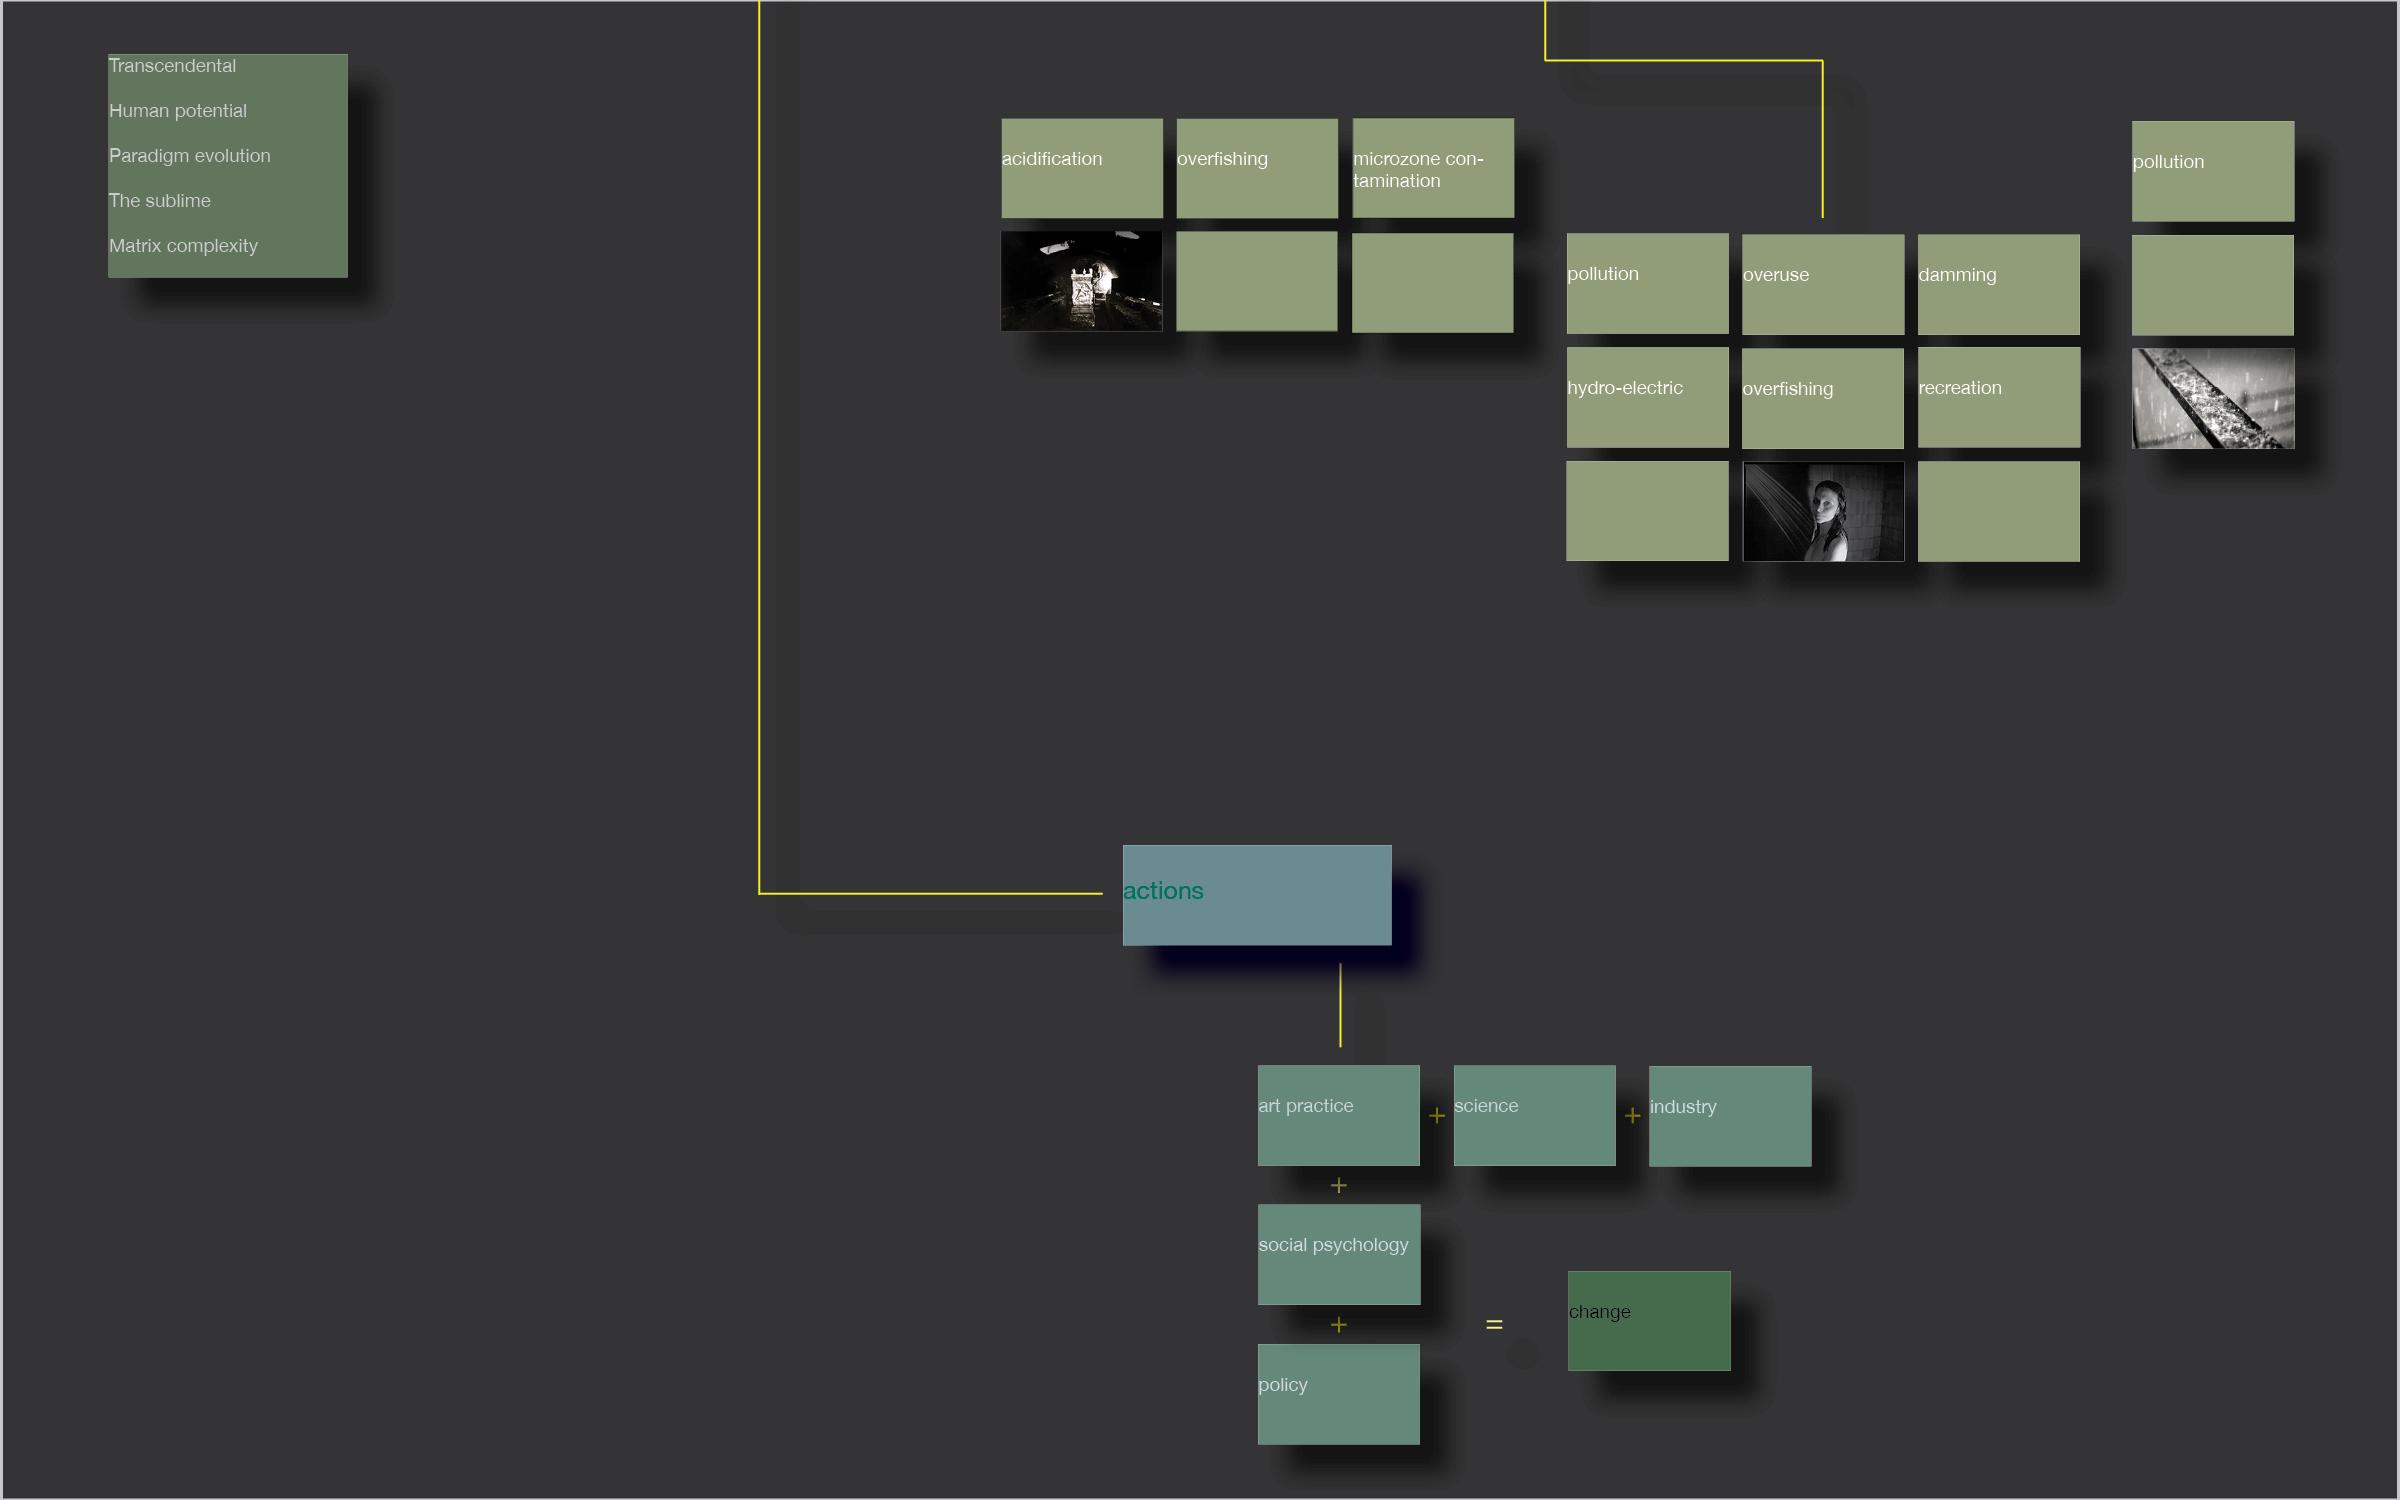 flowchart_sections_final_grey_gradient_single_page7.jpg